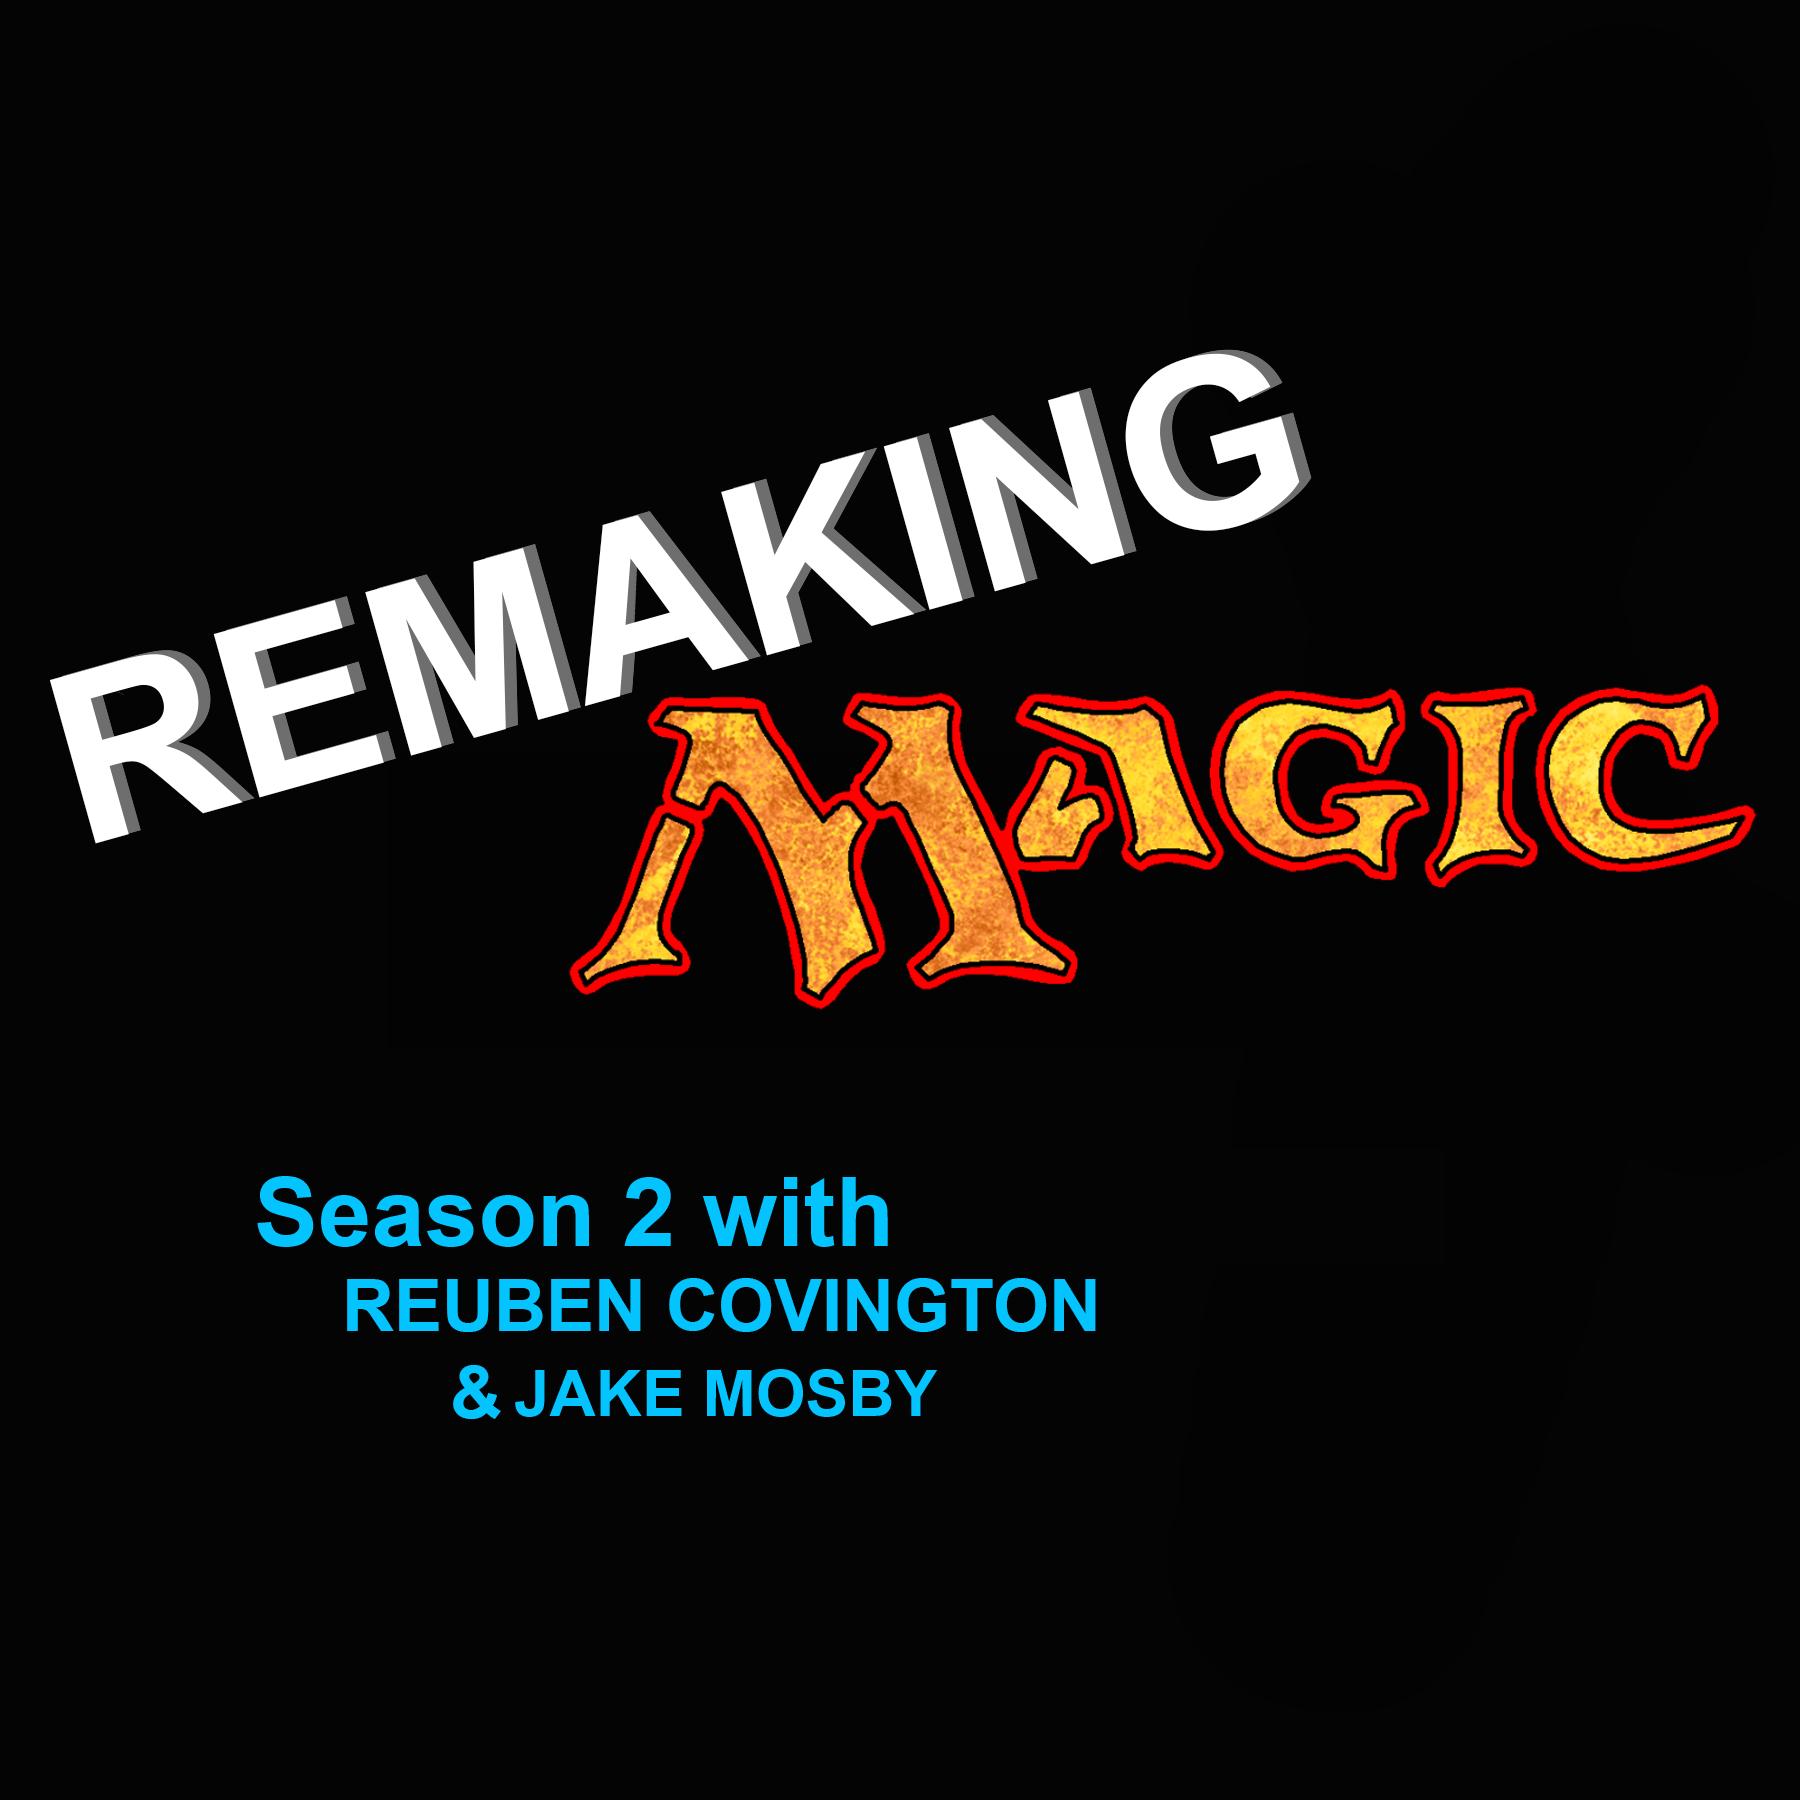 Re-Making Magic S02E01 - A new season show art